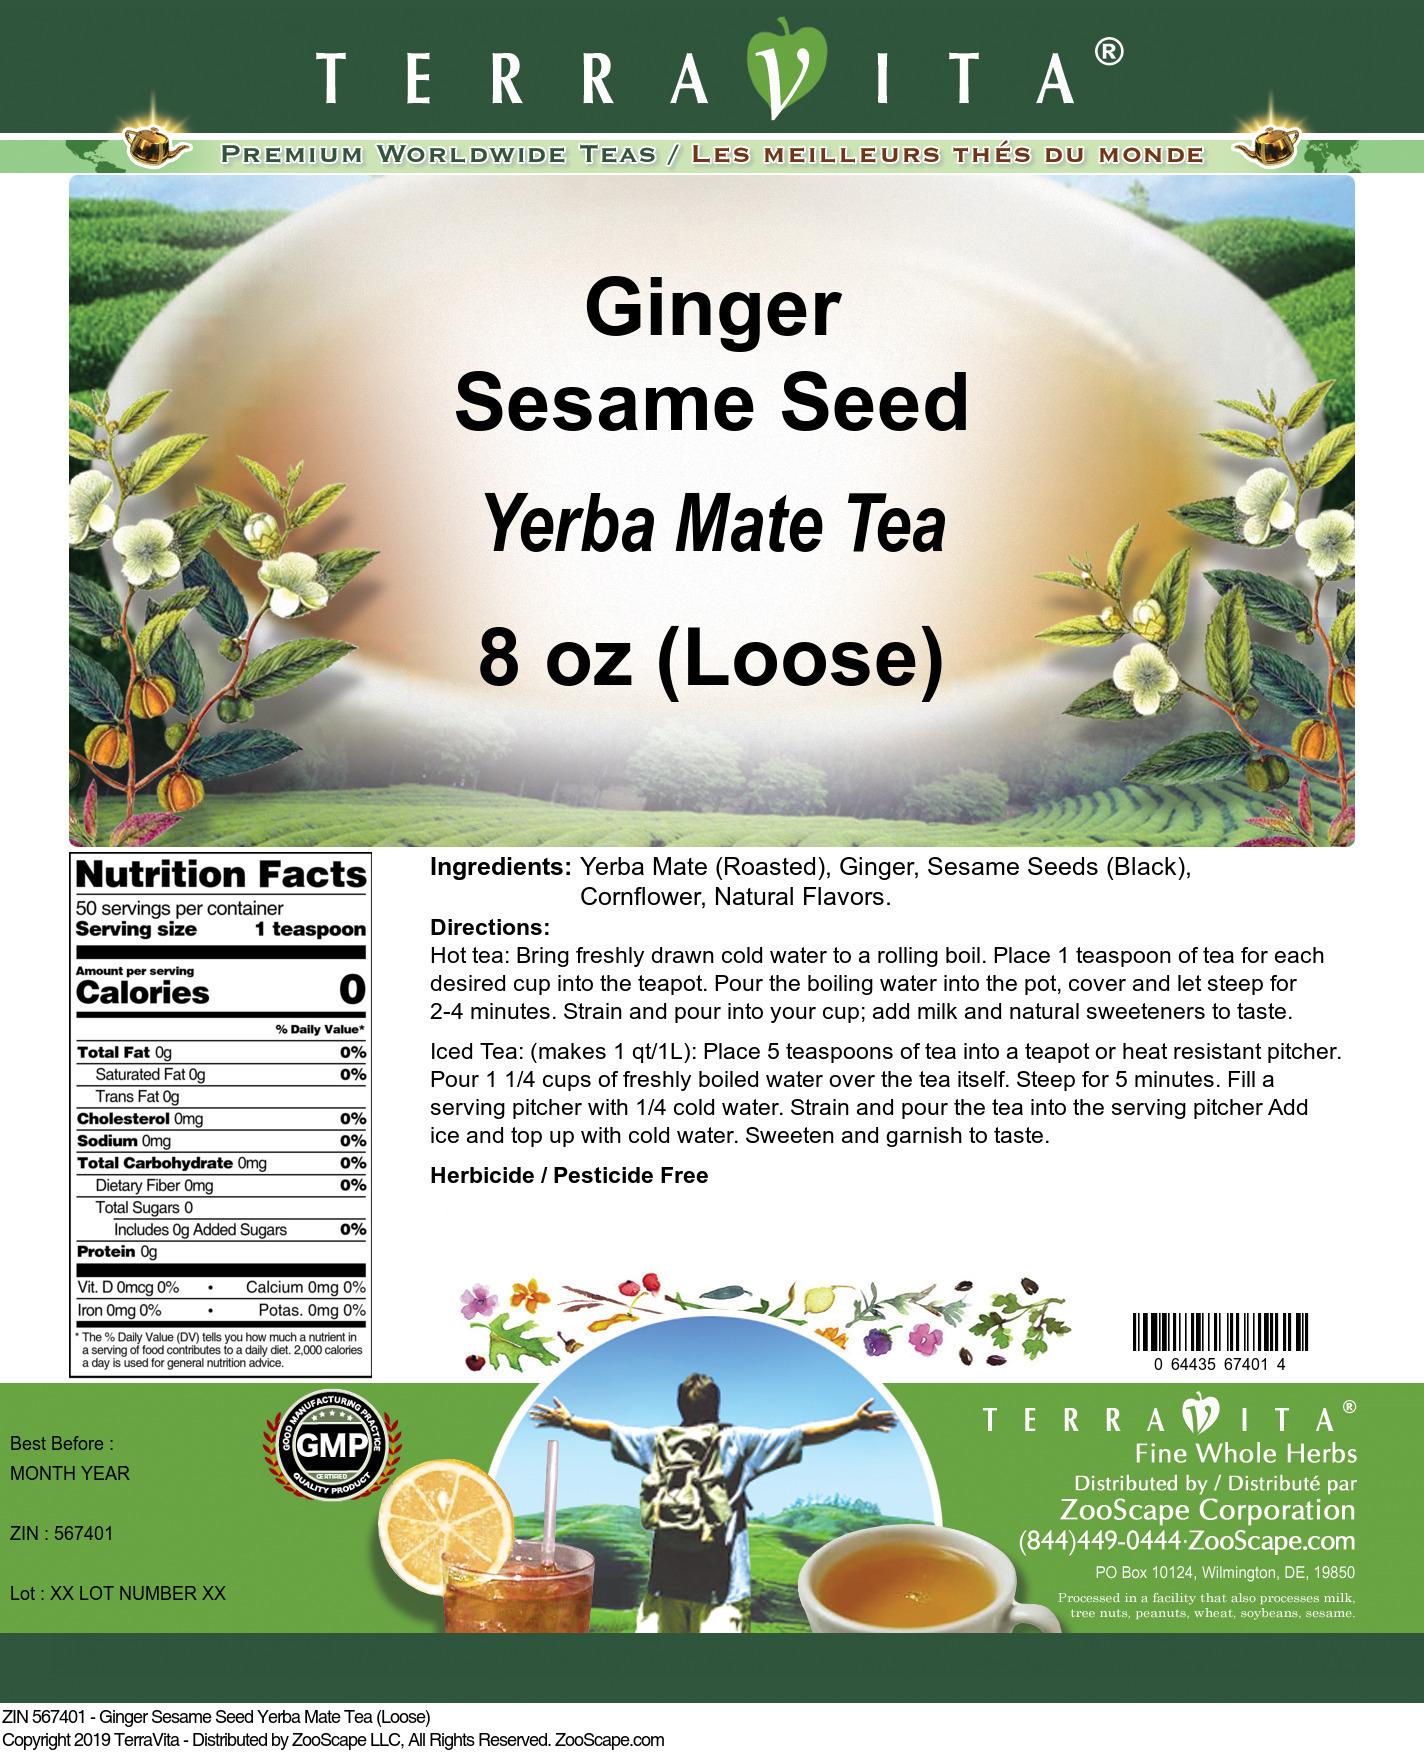 Ginger Sesame Seed Yerba Mate Tea (Loose)